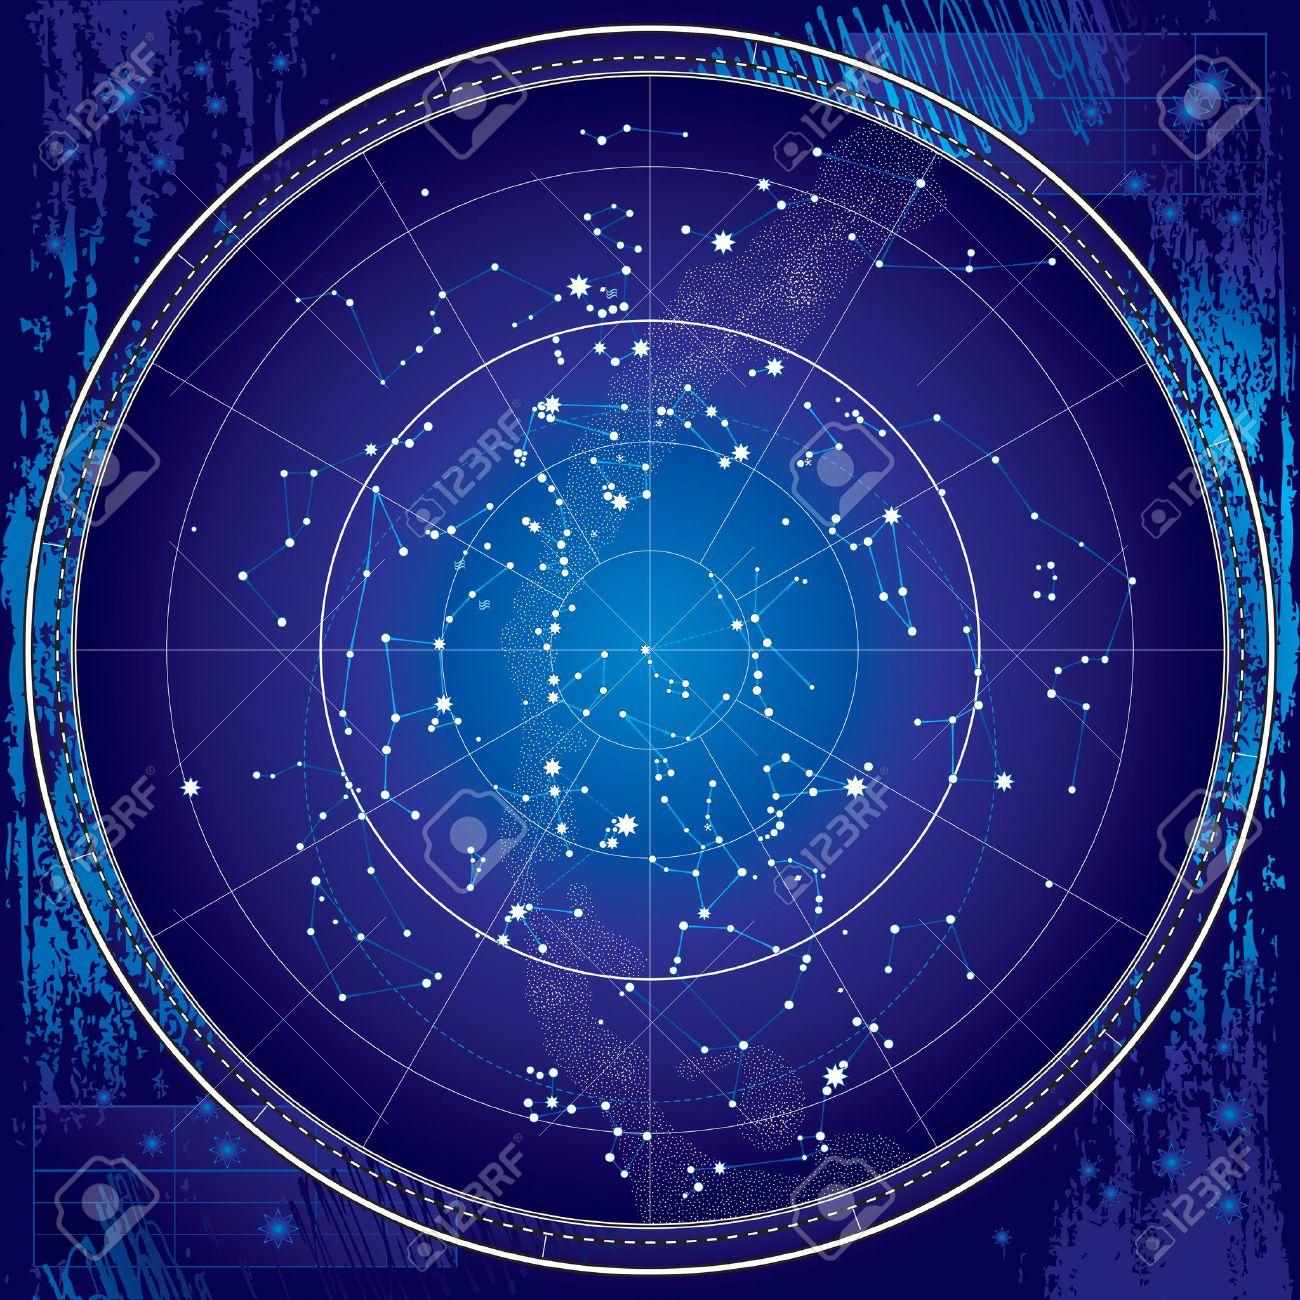 Celestial Map of The Night Sky - Astronomical Chart of Northern Hemisphere - Dark Blueprint version EPS-8 - 25697698